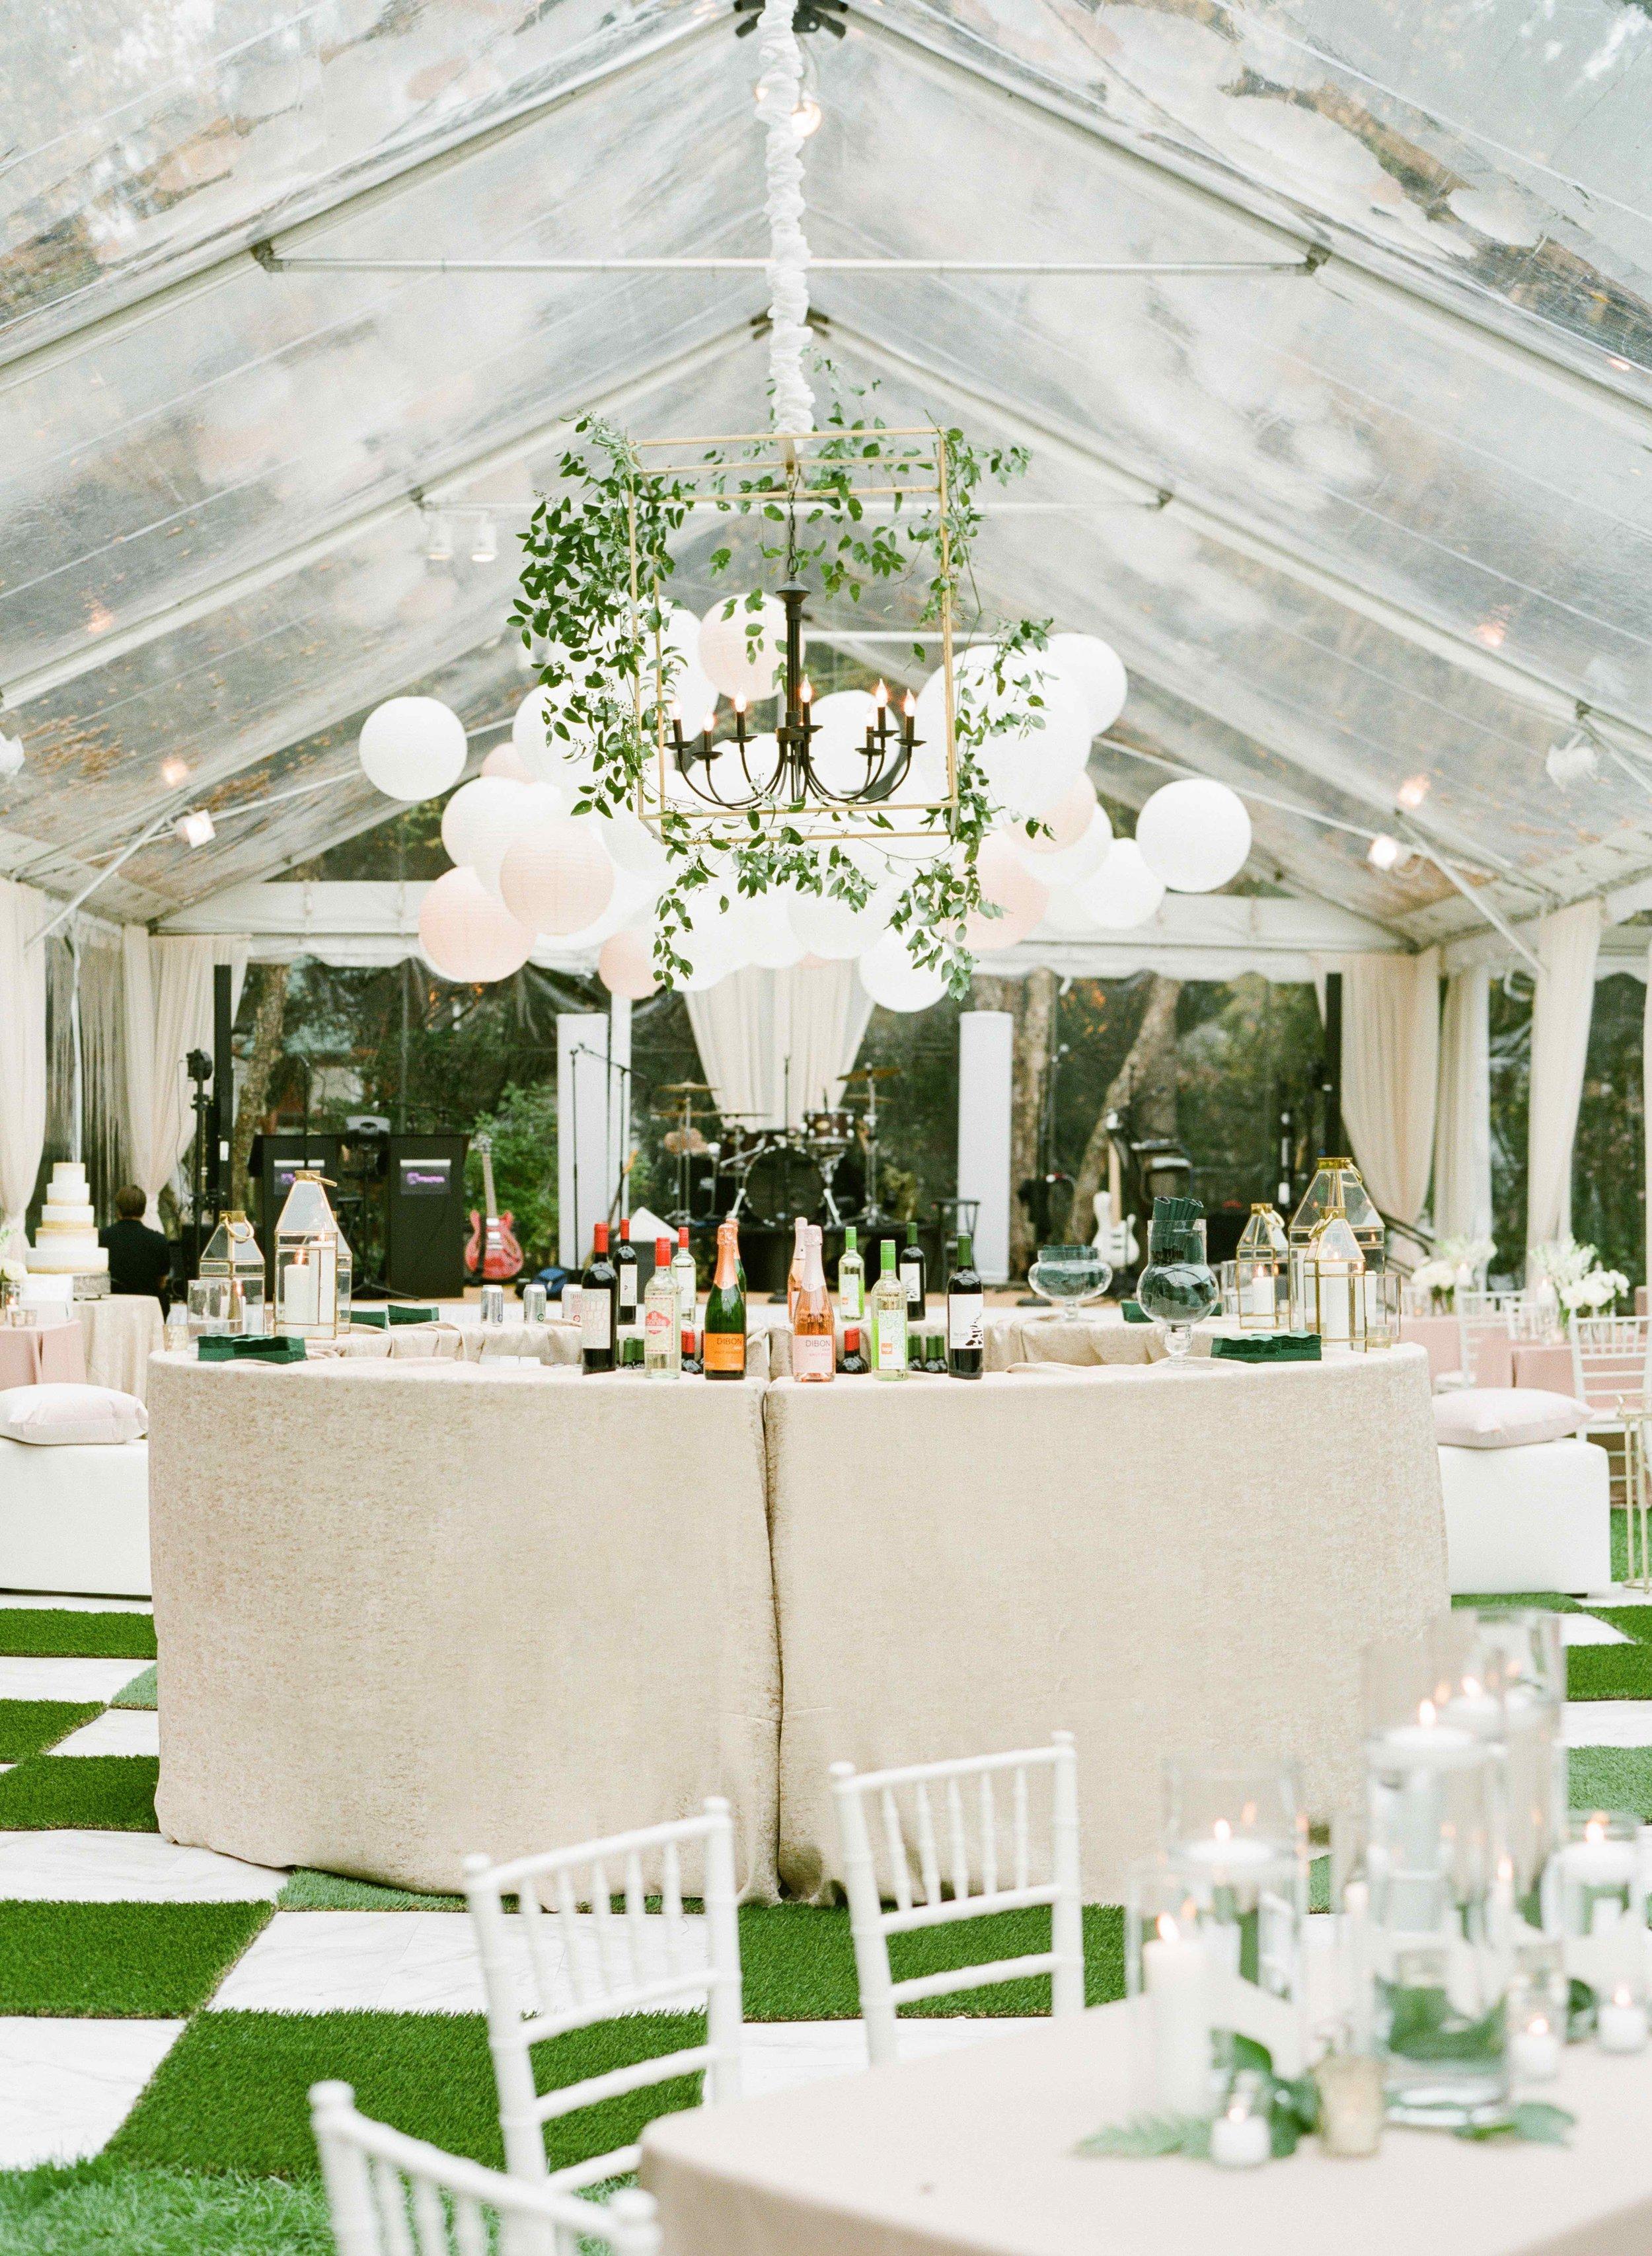 raleigh_nc_wedding_photographer_film_caseyrosephotography_sydbuzz_173.jpg